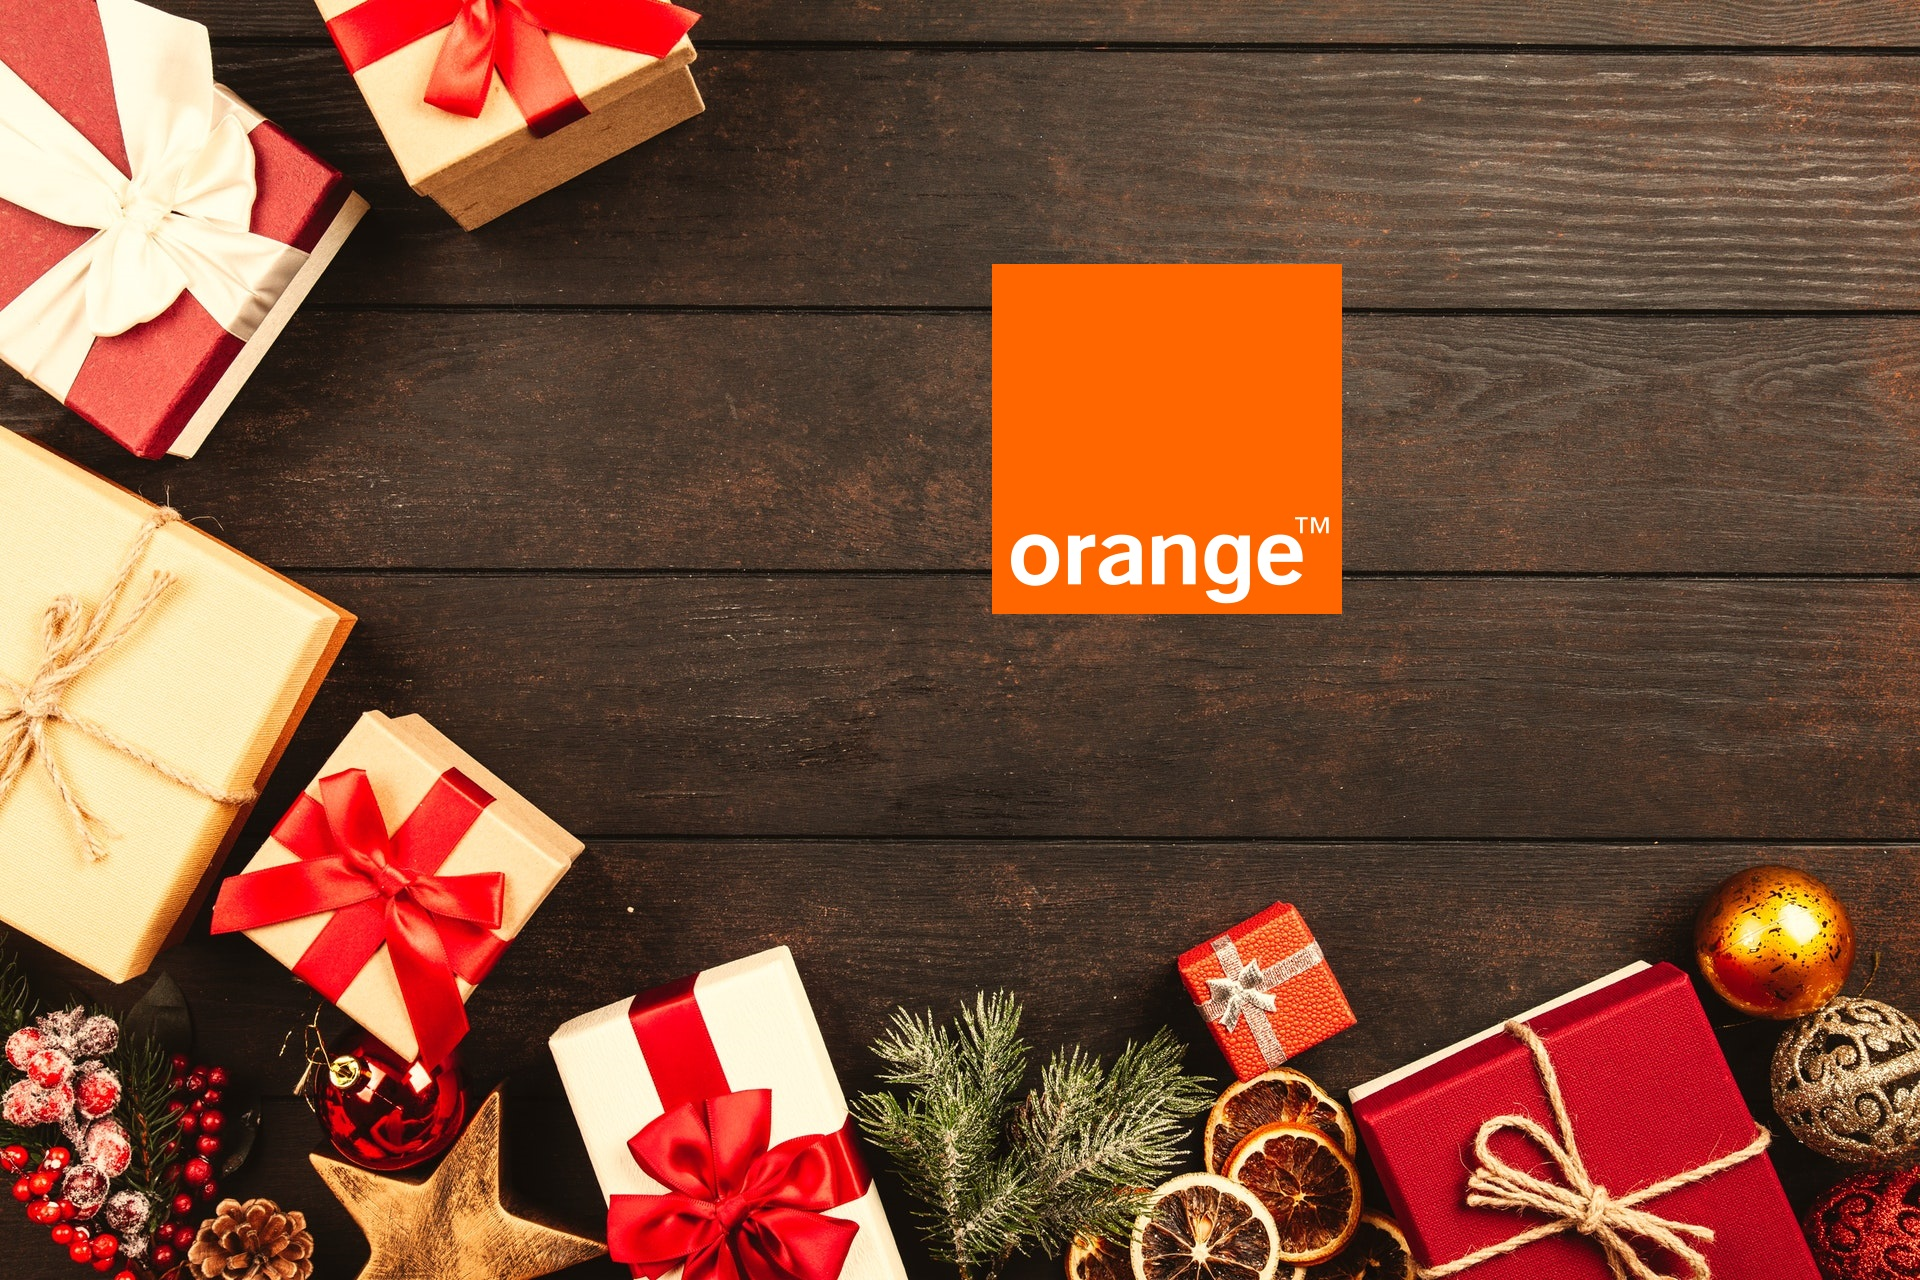 Telewizor i drugi smartfon za złotówkę na święta od Orange 26